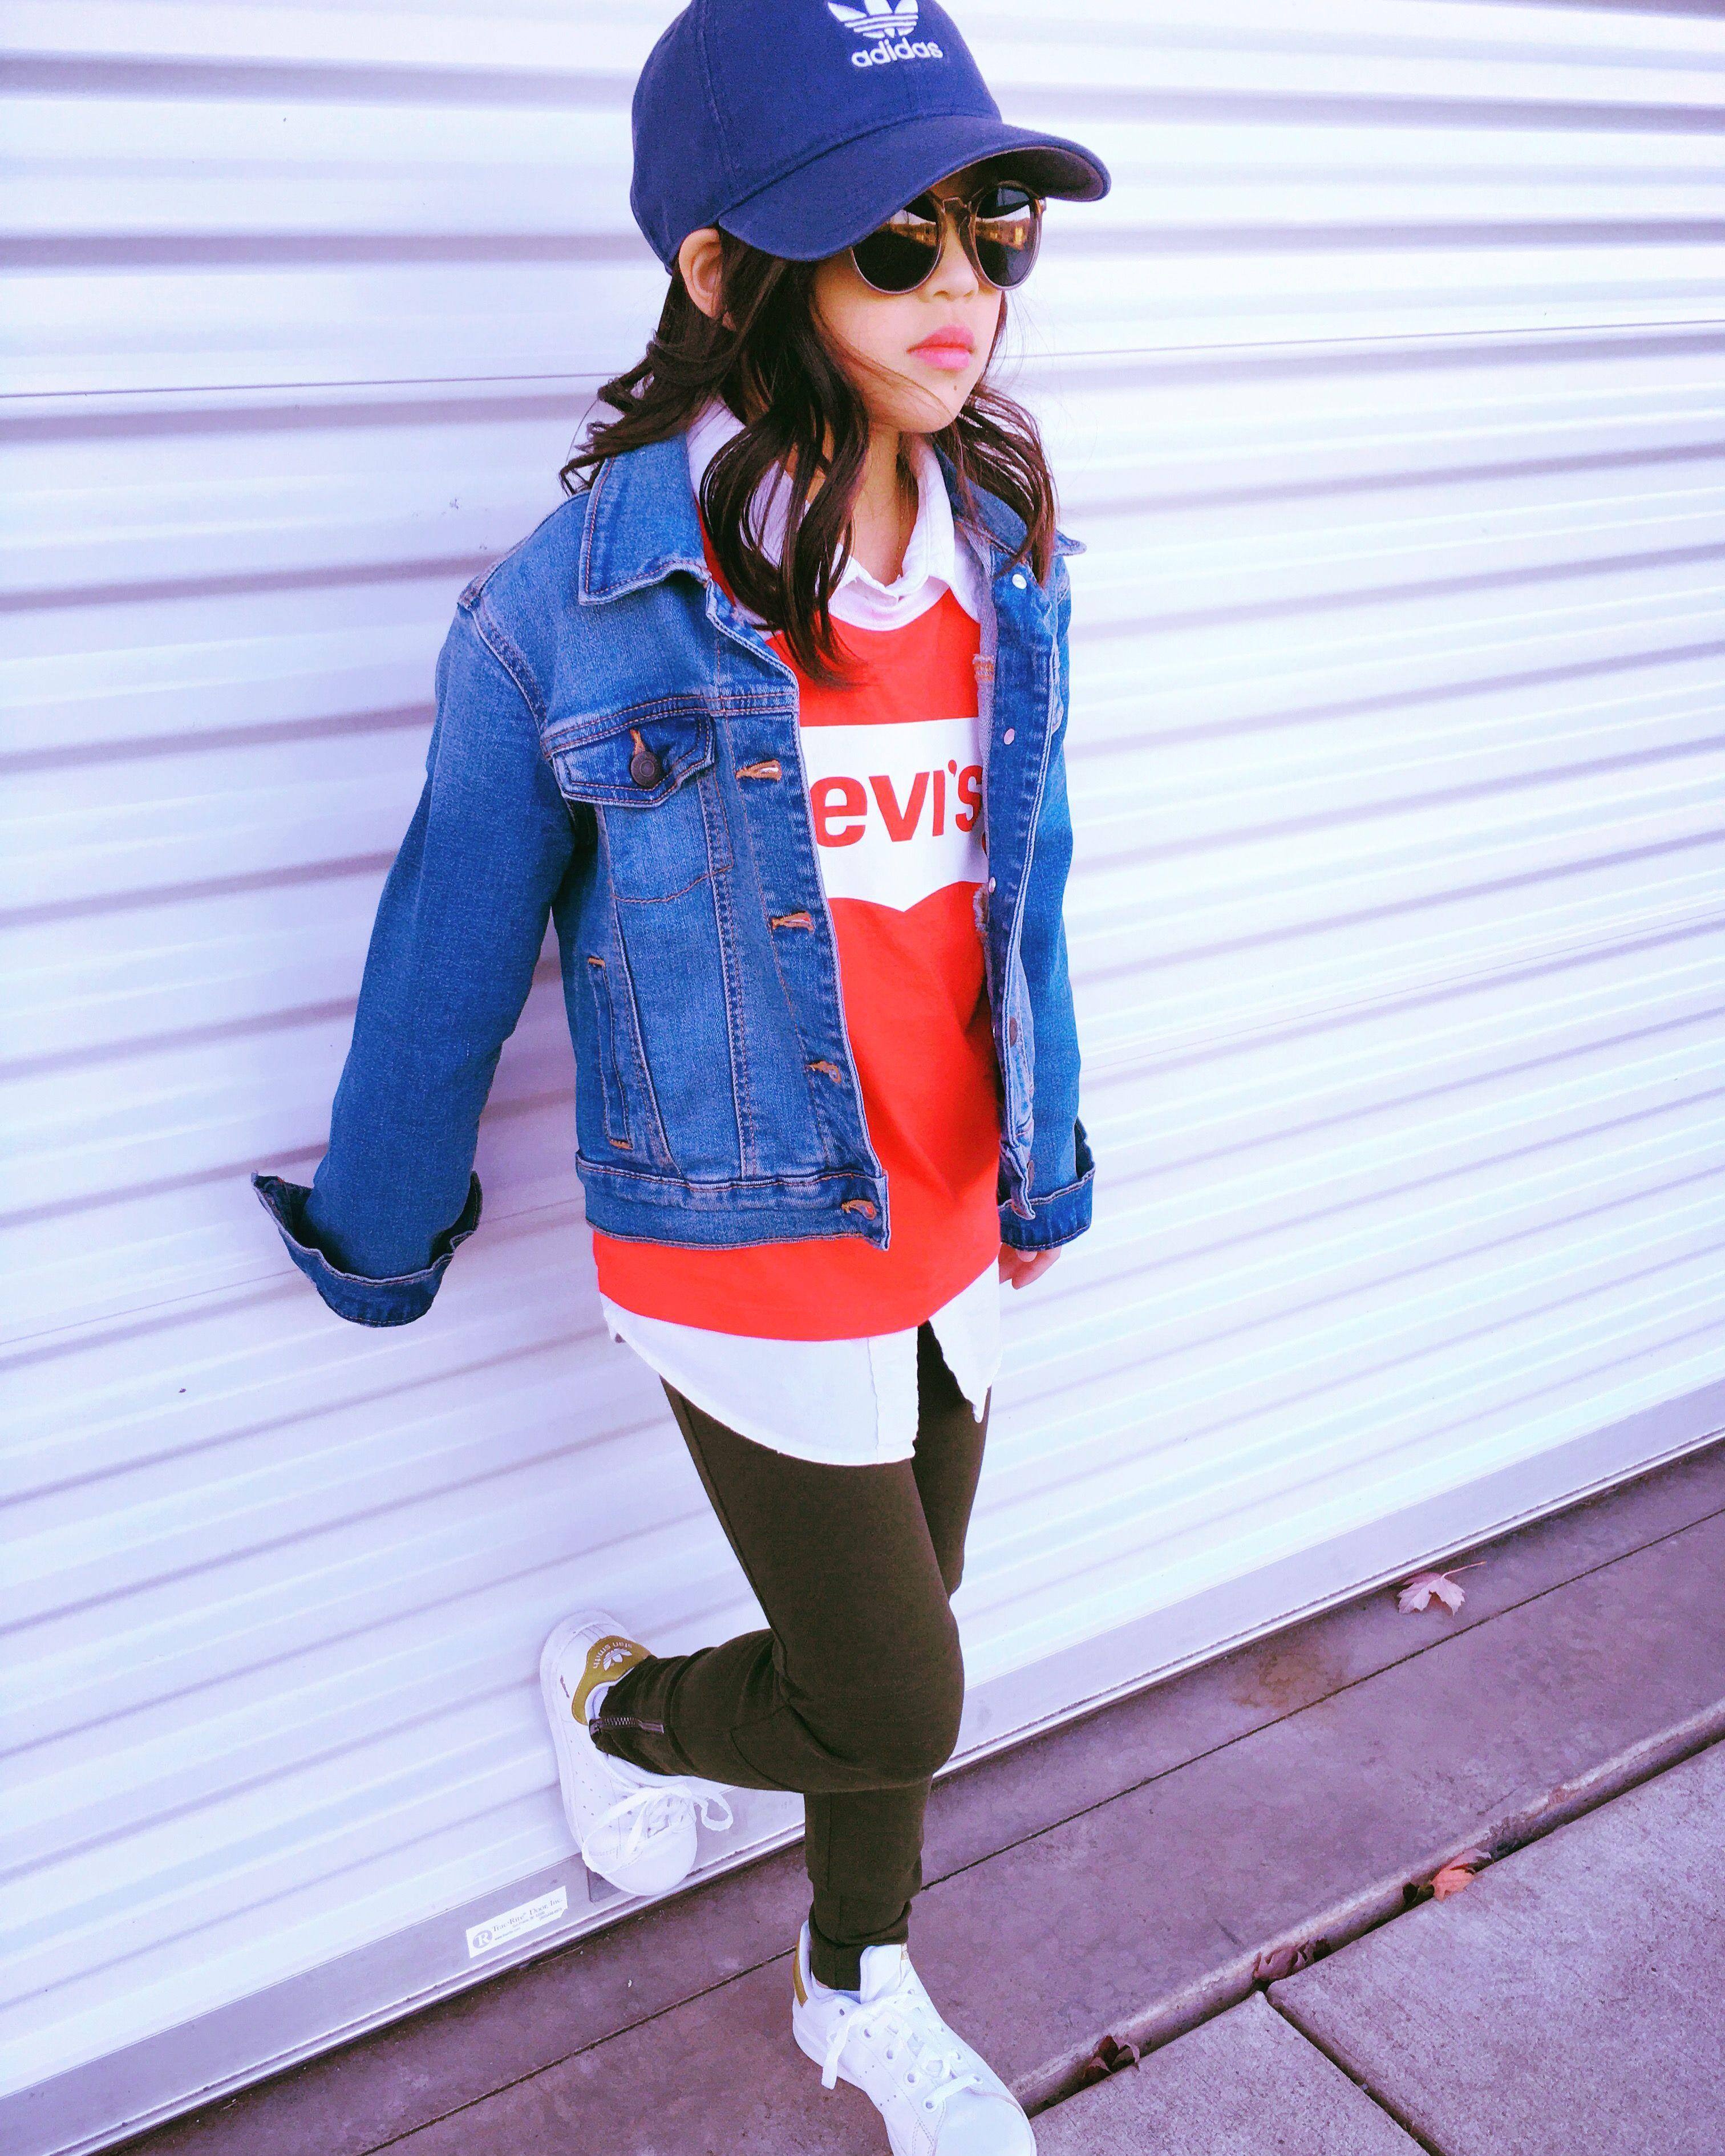 Levi S Denim Jean Jacket Outfit Jean Jacket Outfits Adidas Outfit Denim Jean Jacket Outfits [ 3780 x 3024 Pixel ]